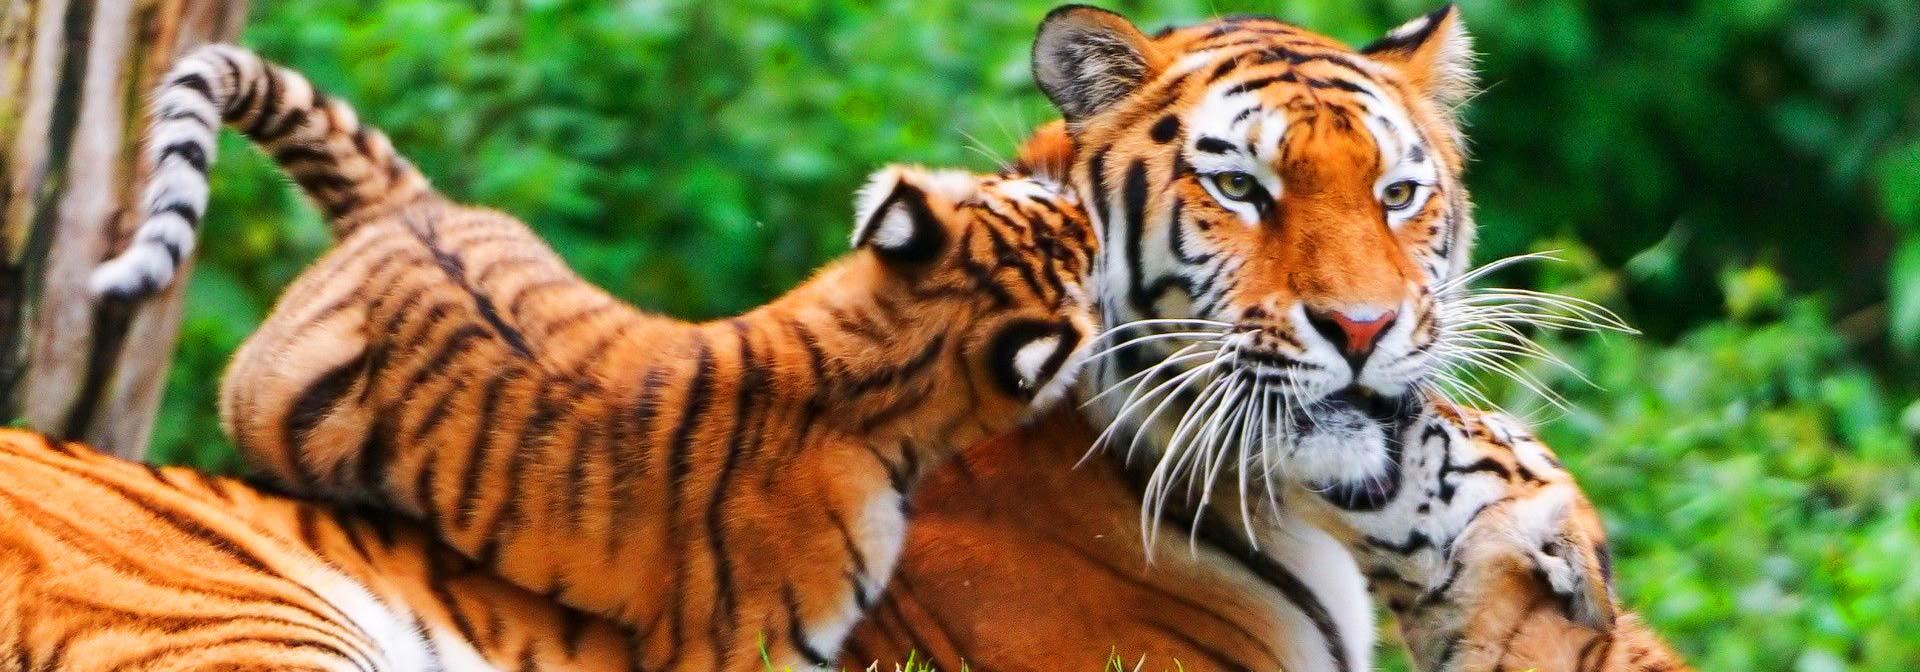 monde sauvage safari parc aywaille parc animalier zoo accueil parc animalier safari voiture. Black Bedroom Furniture Sets. Home Design Ideas